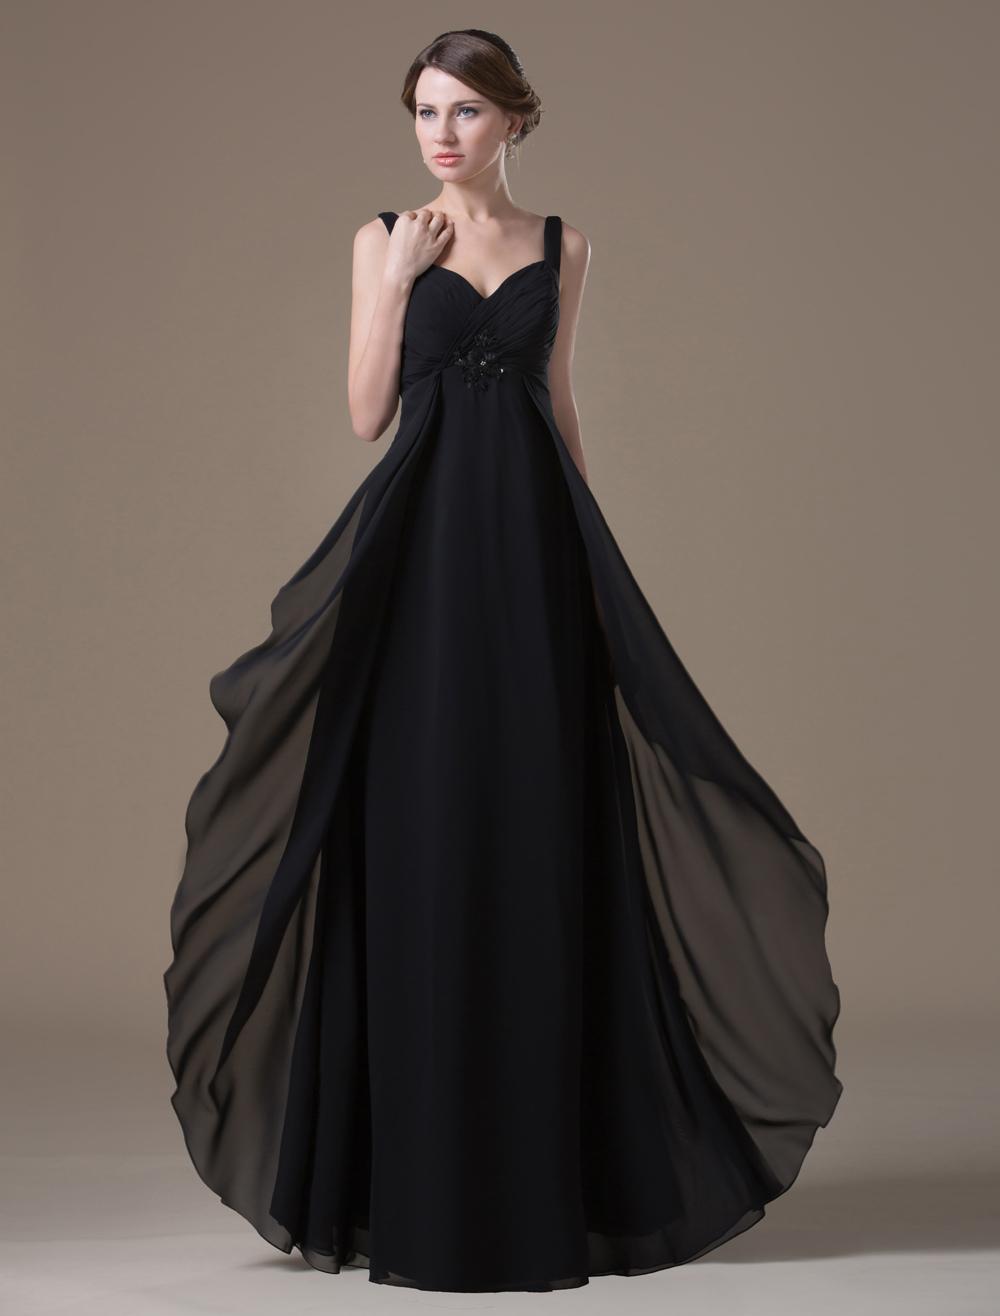 Sexy Black Spandex Chiffon A-line Maternity Bridesmaid Dress